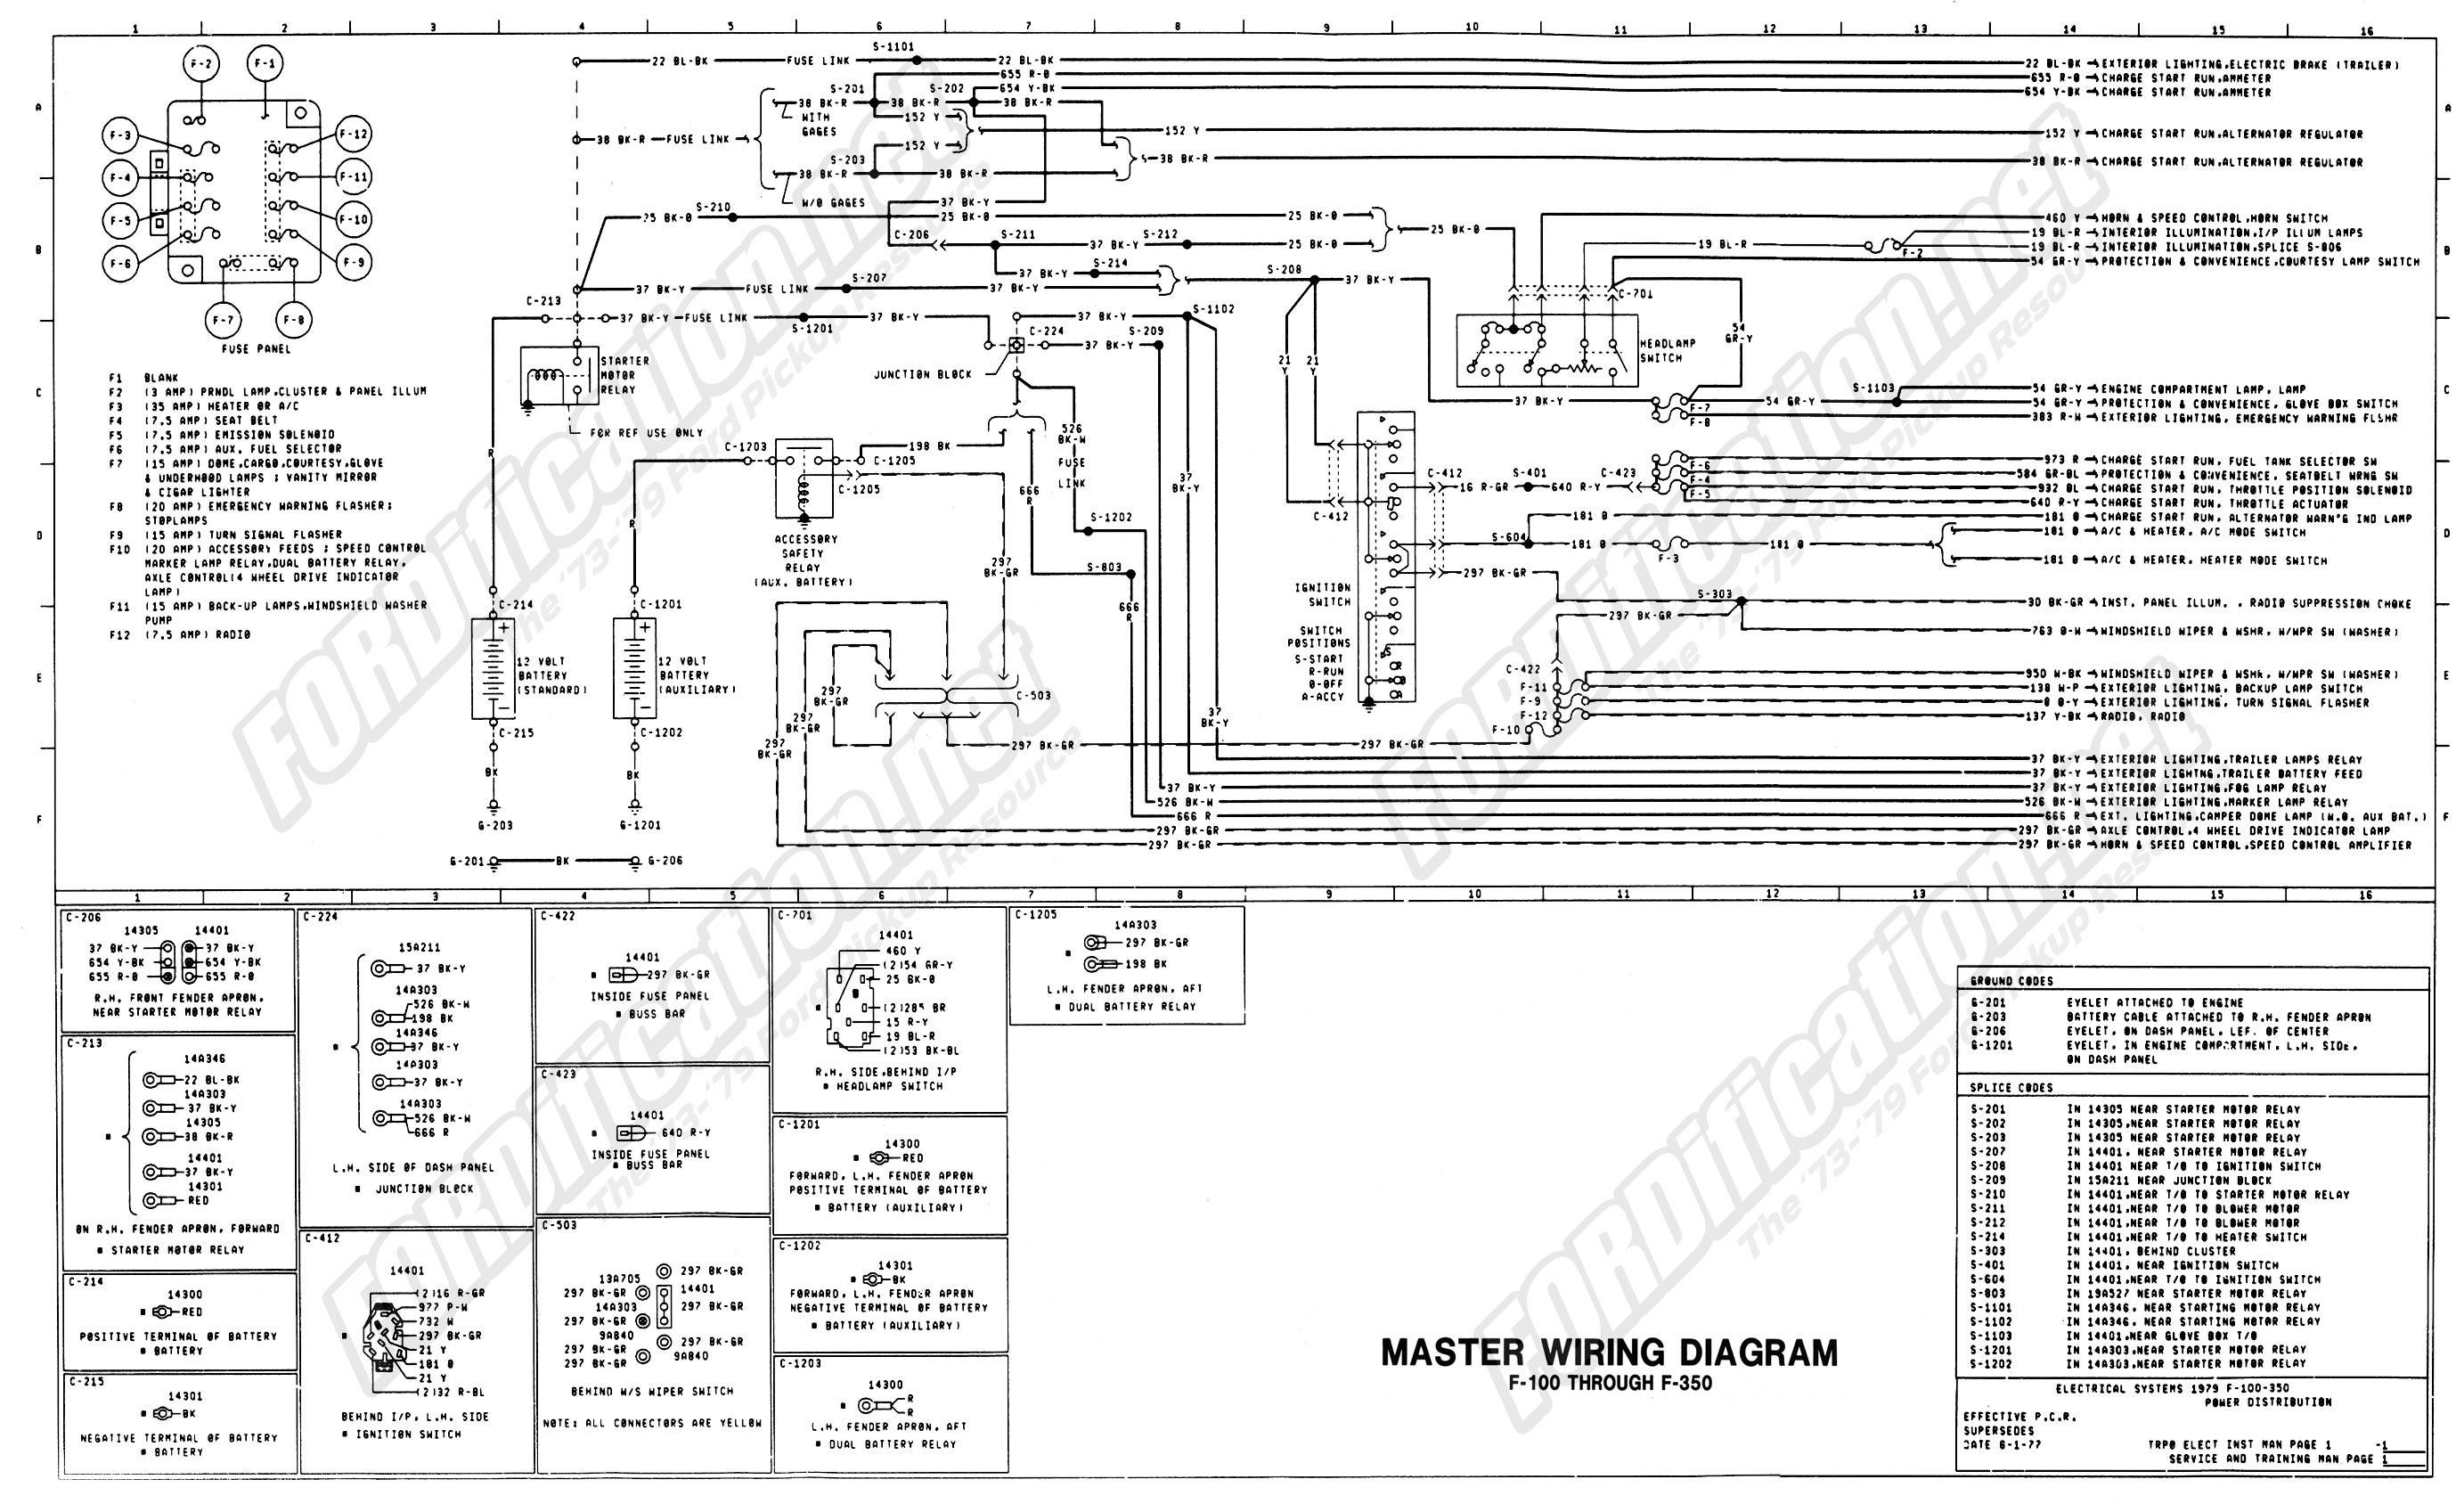 Mack Truck Electrical Wiring Diagram